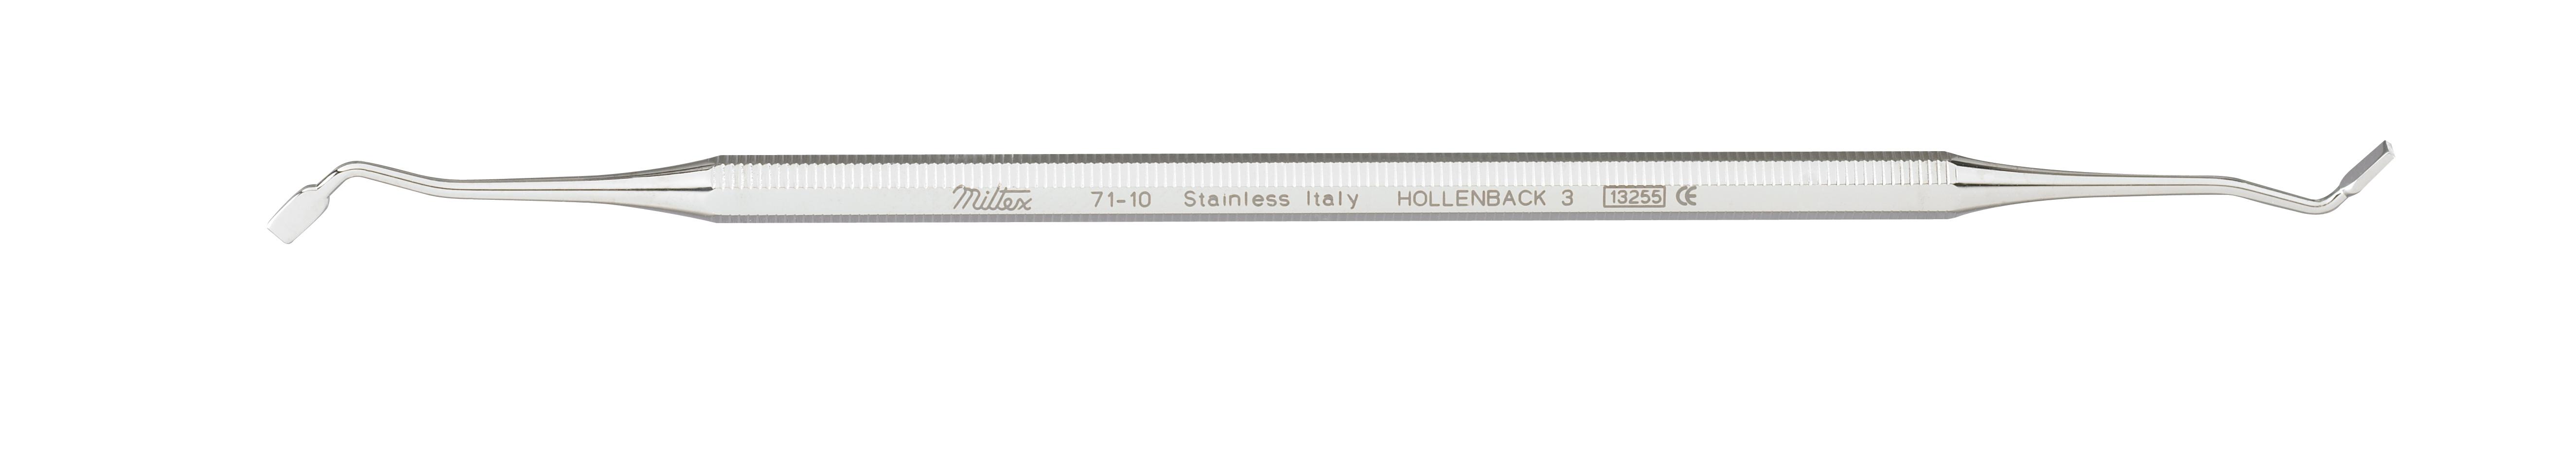 hollenback-plugger-3-de-71-10-miltex.jpg